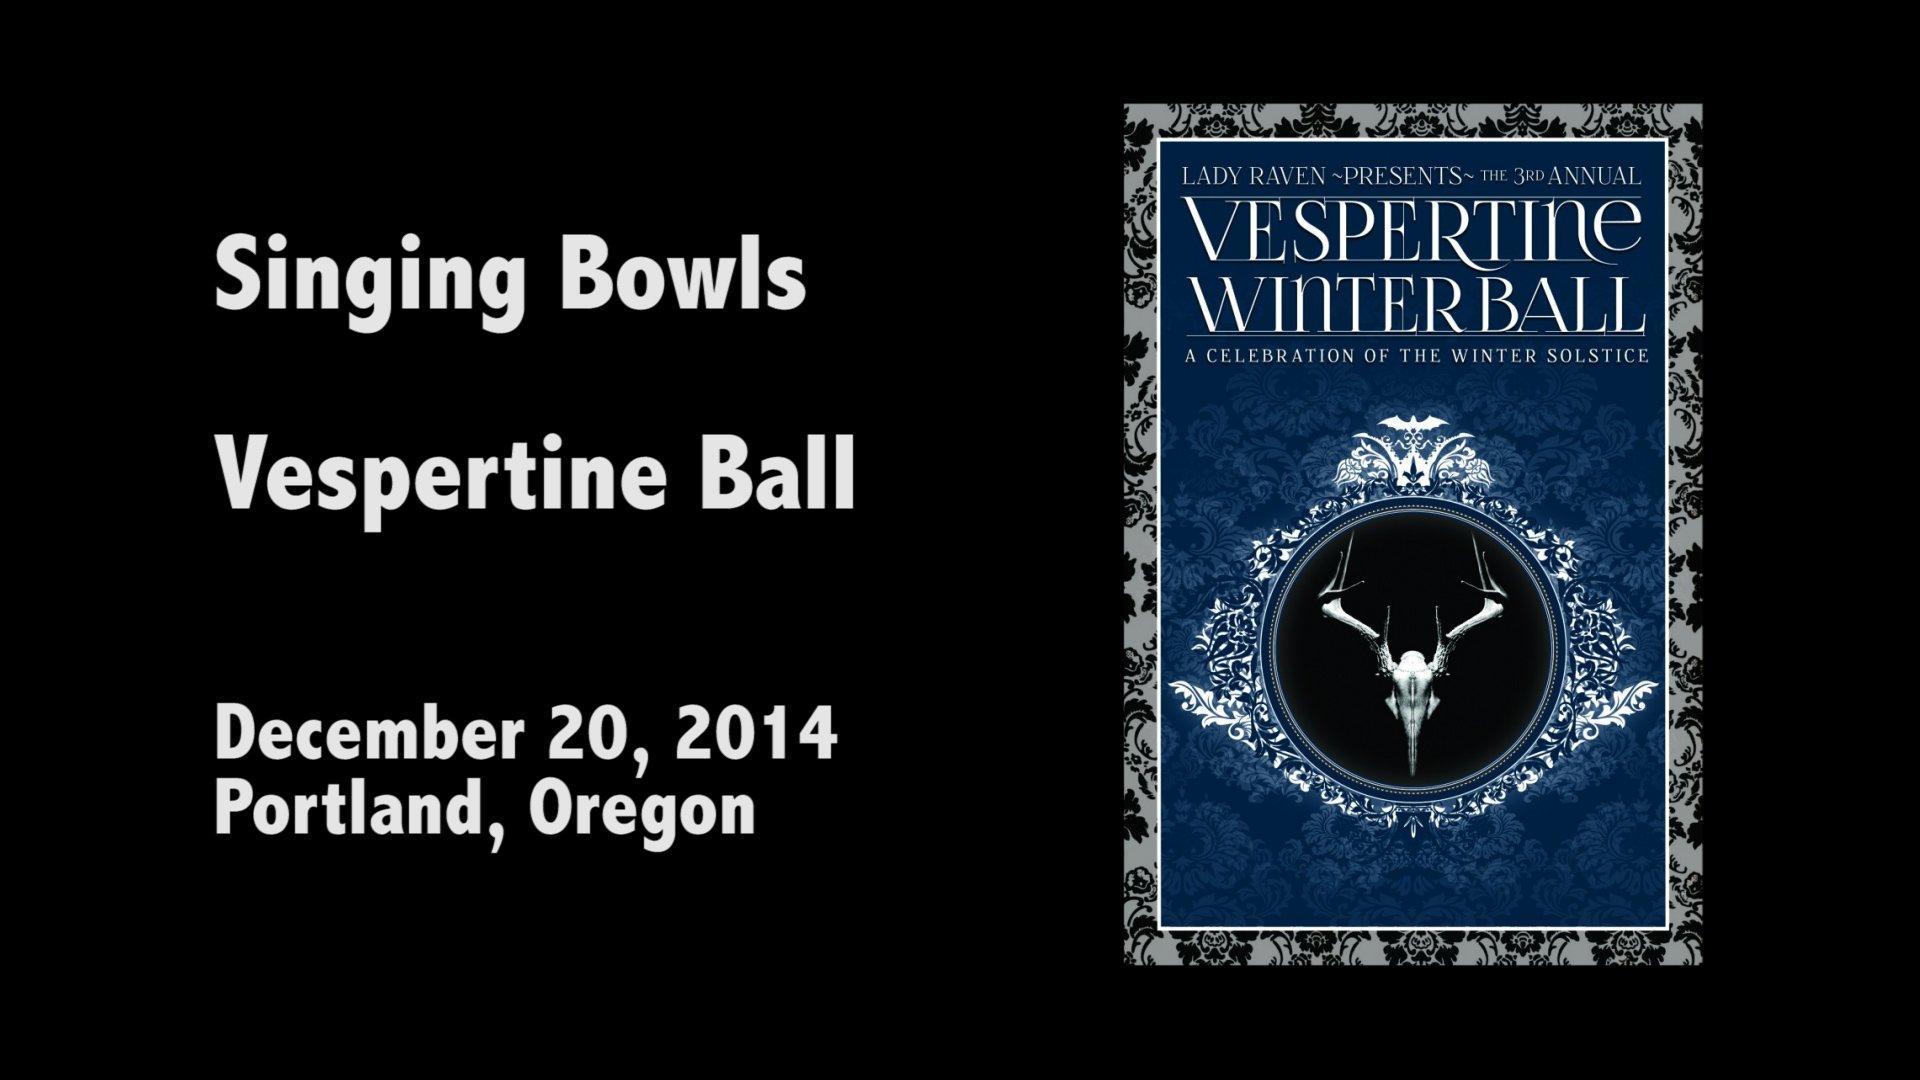 Vespertine Winter Ball – Singing Bowls